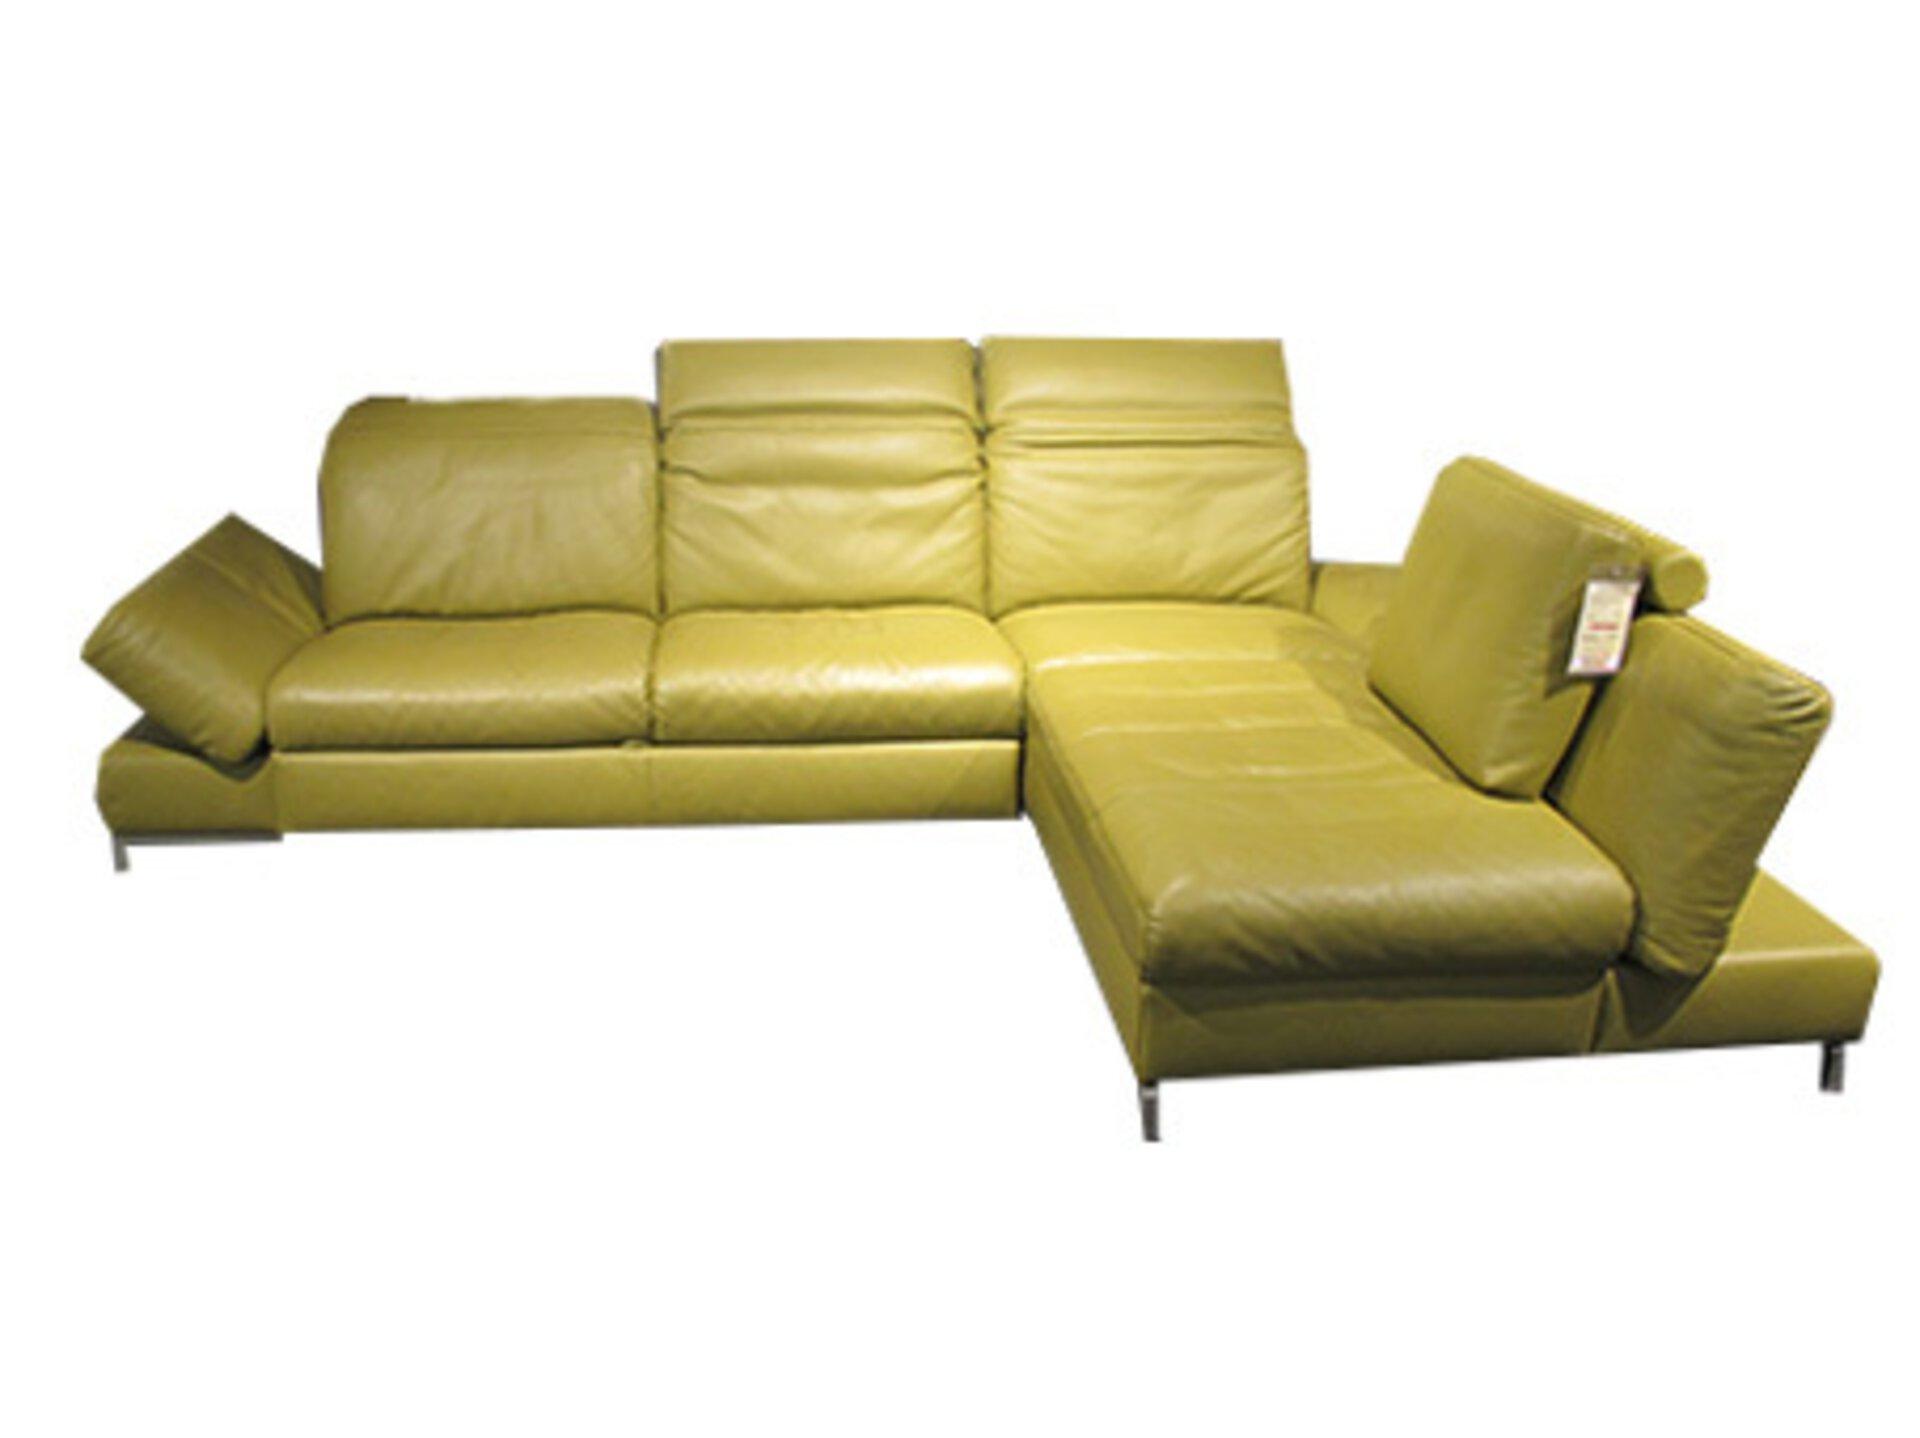 Ecksofa 1510 BPW Leder 213 x 85 x 319 cm